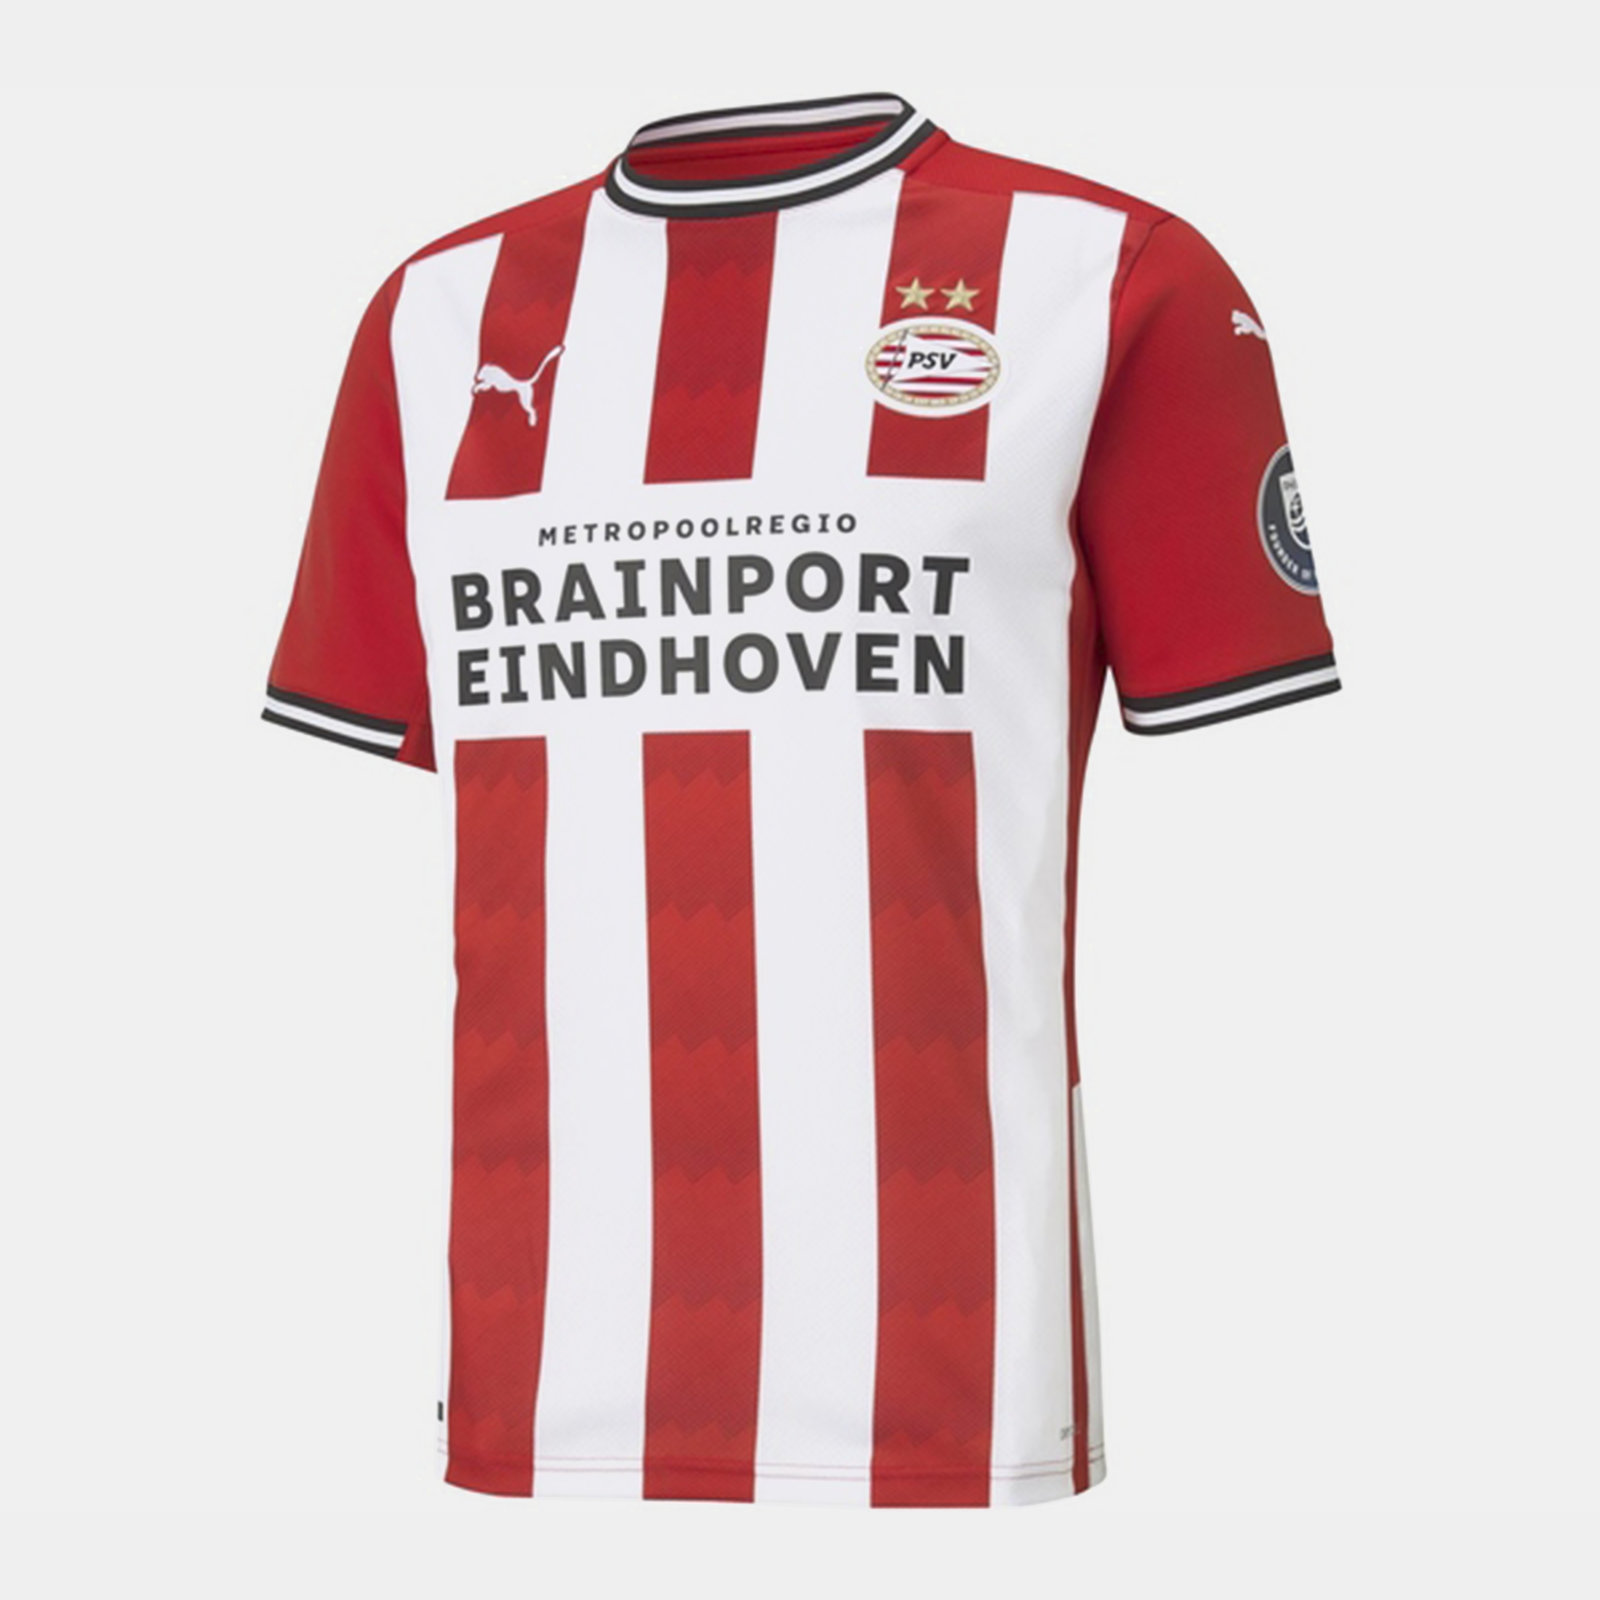 PSV Eindhoven Home Shirt 2020 2021